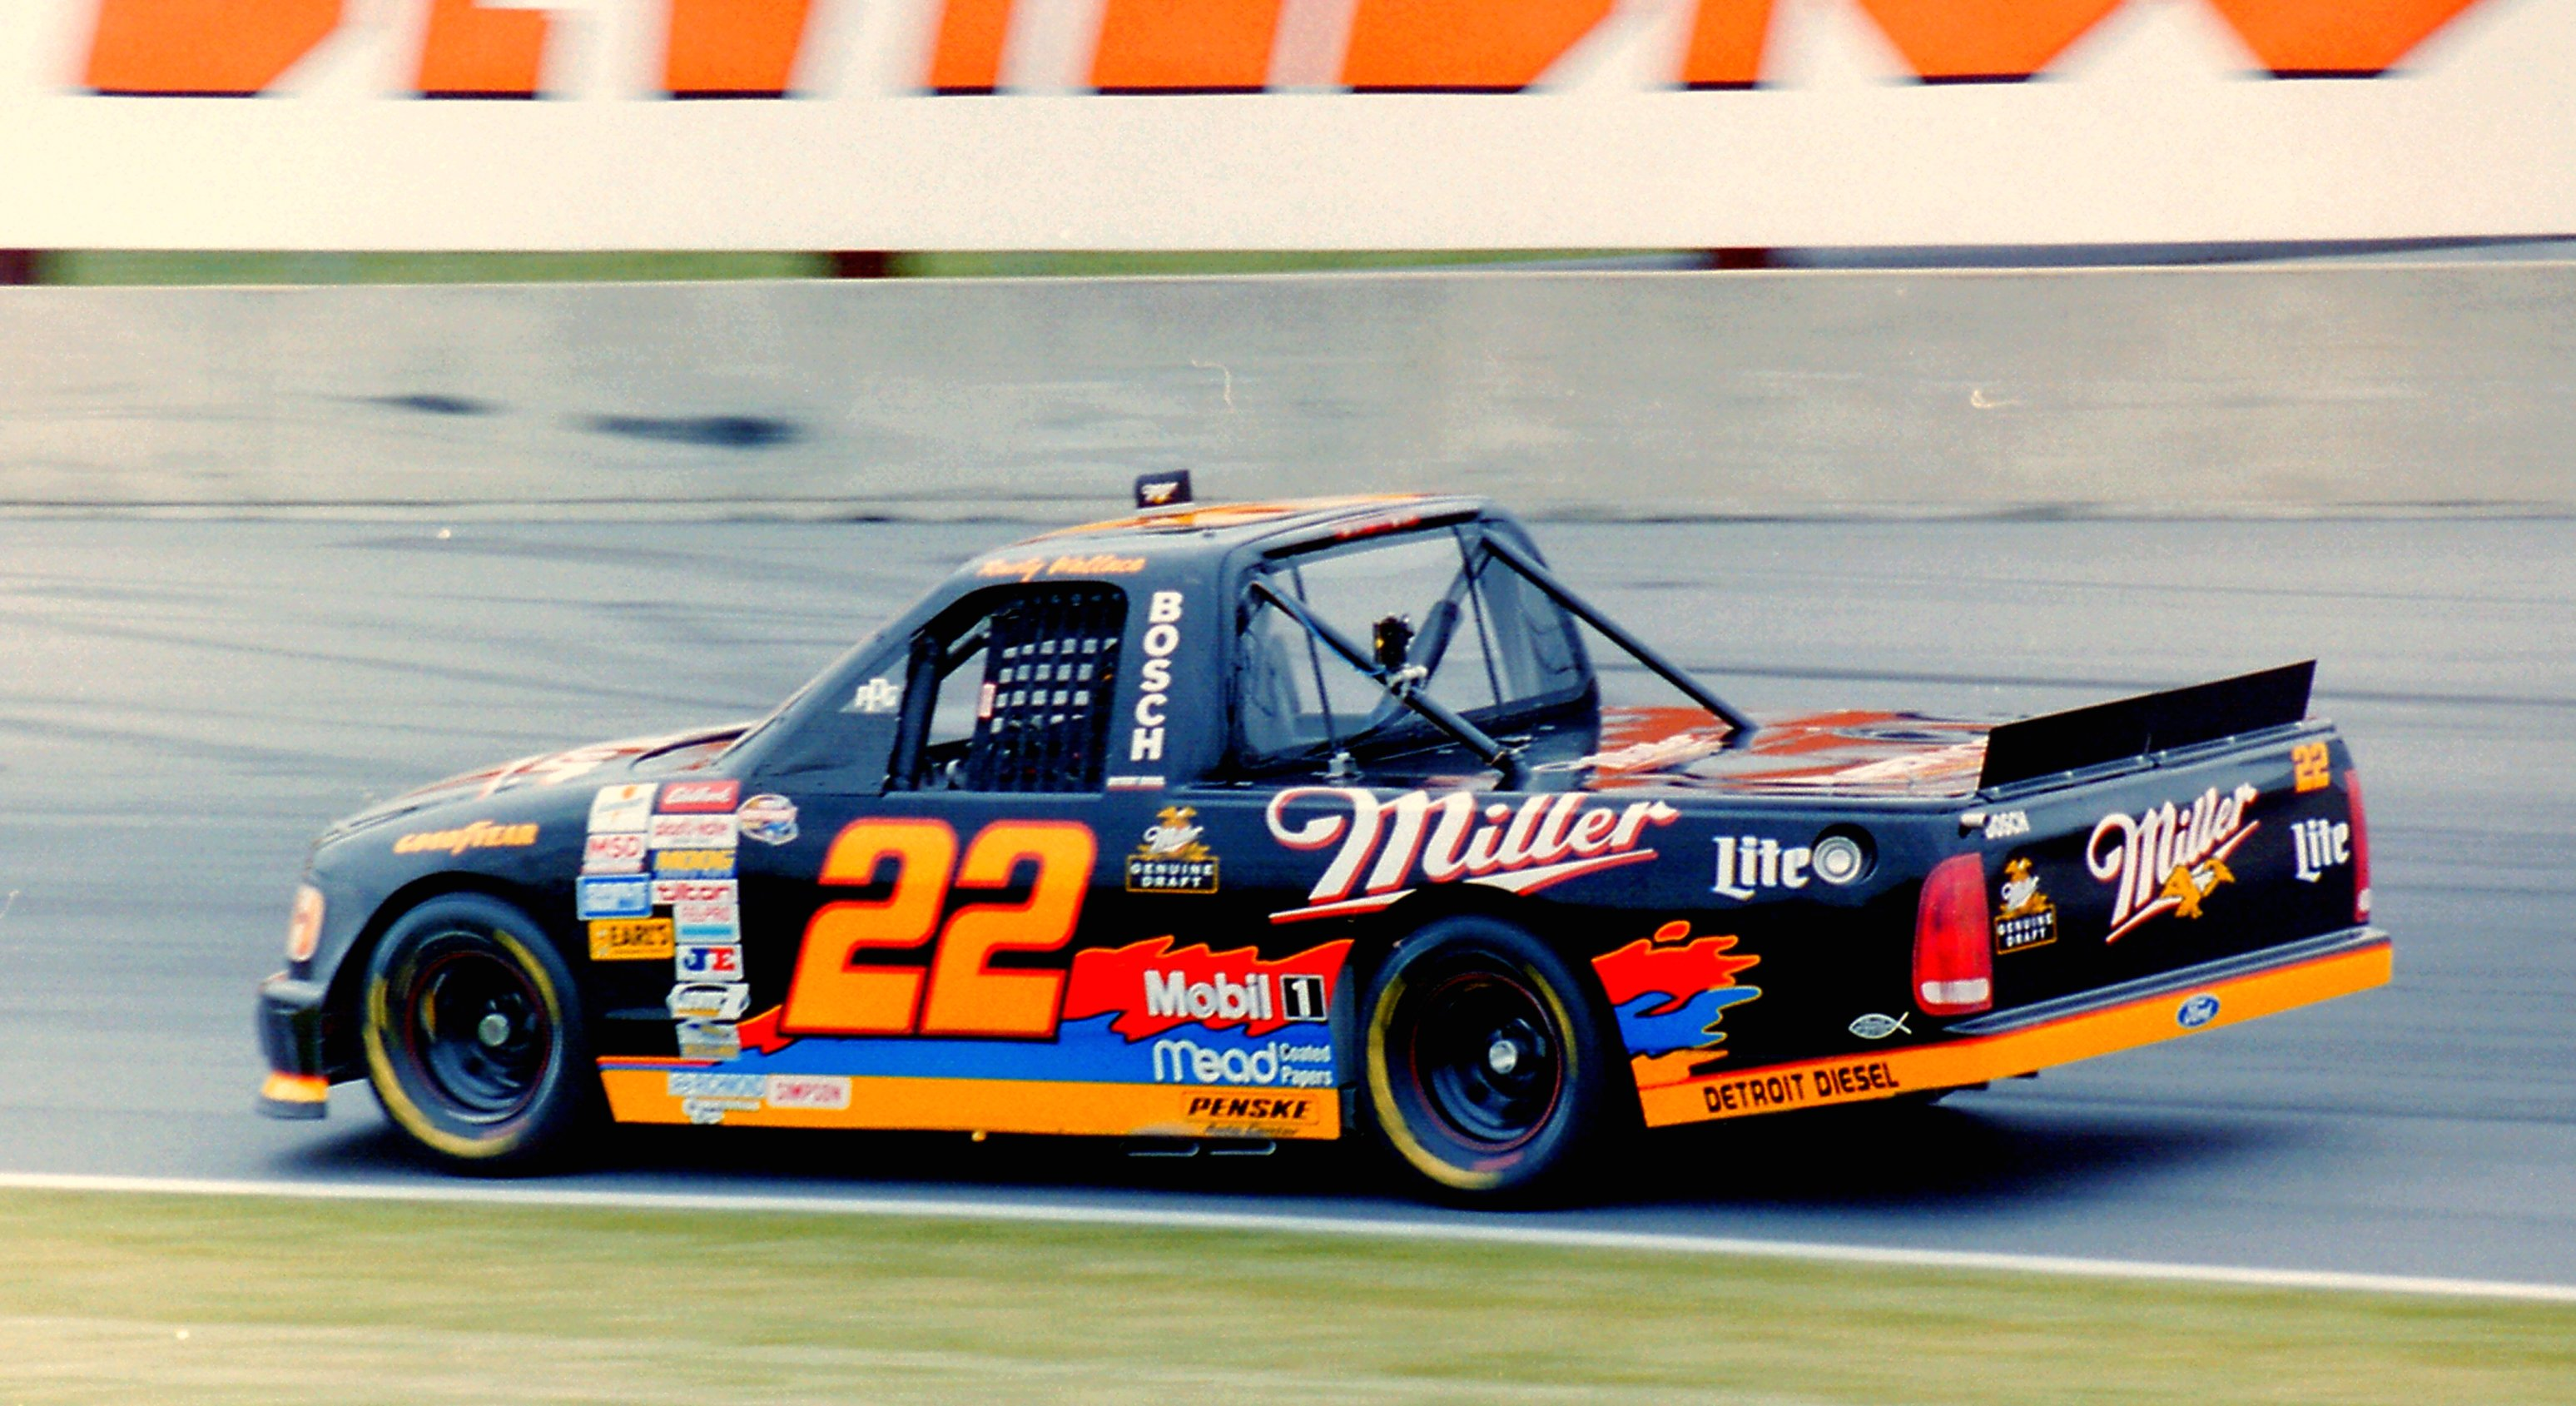 Rusty Wallace Ford >> File:Rusty Wallace Penske South Ford Nazareth 1996.jpg ...